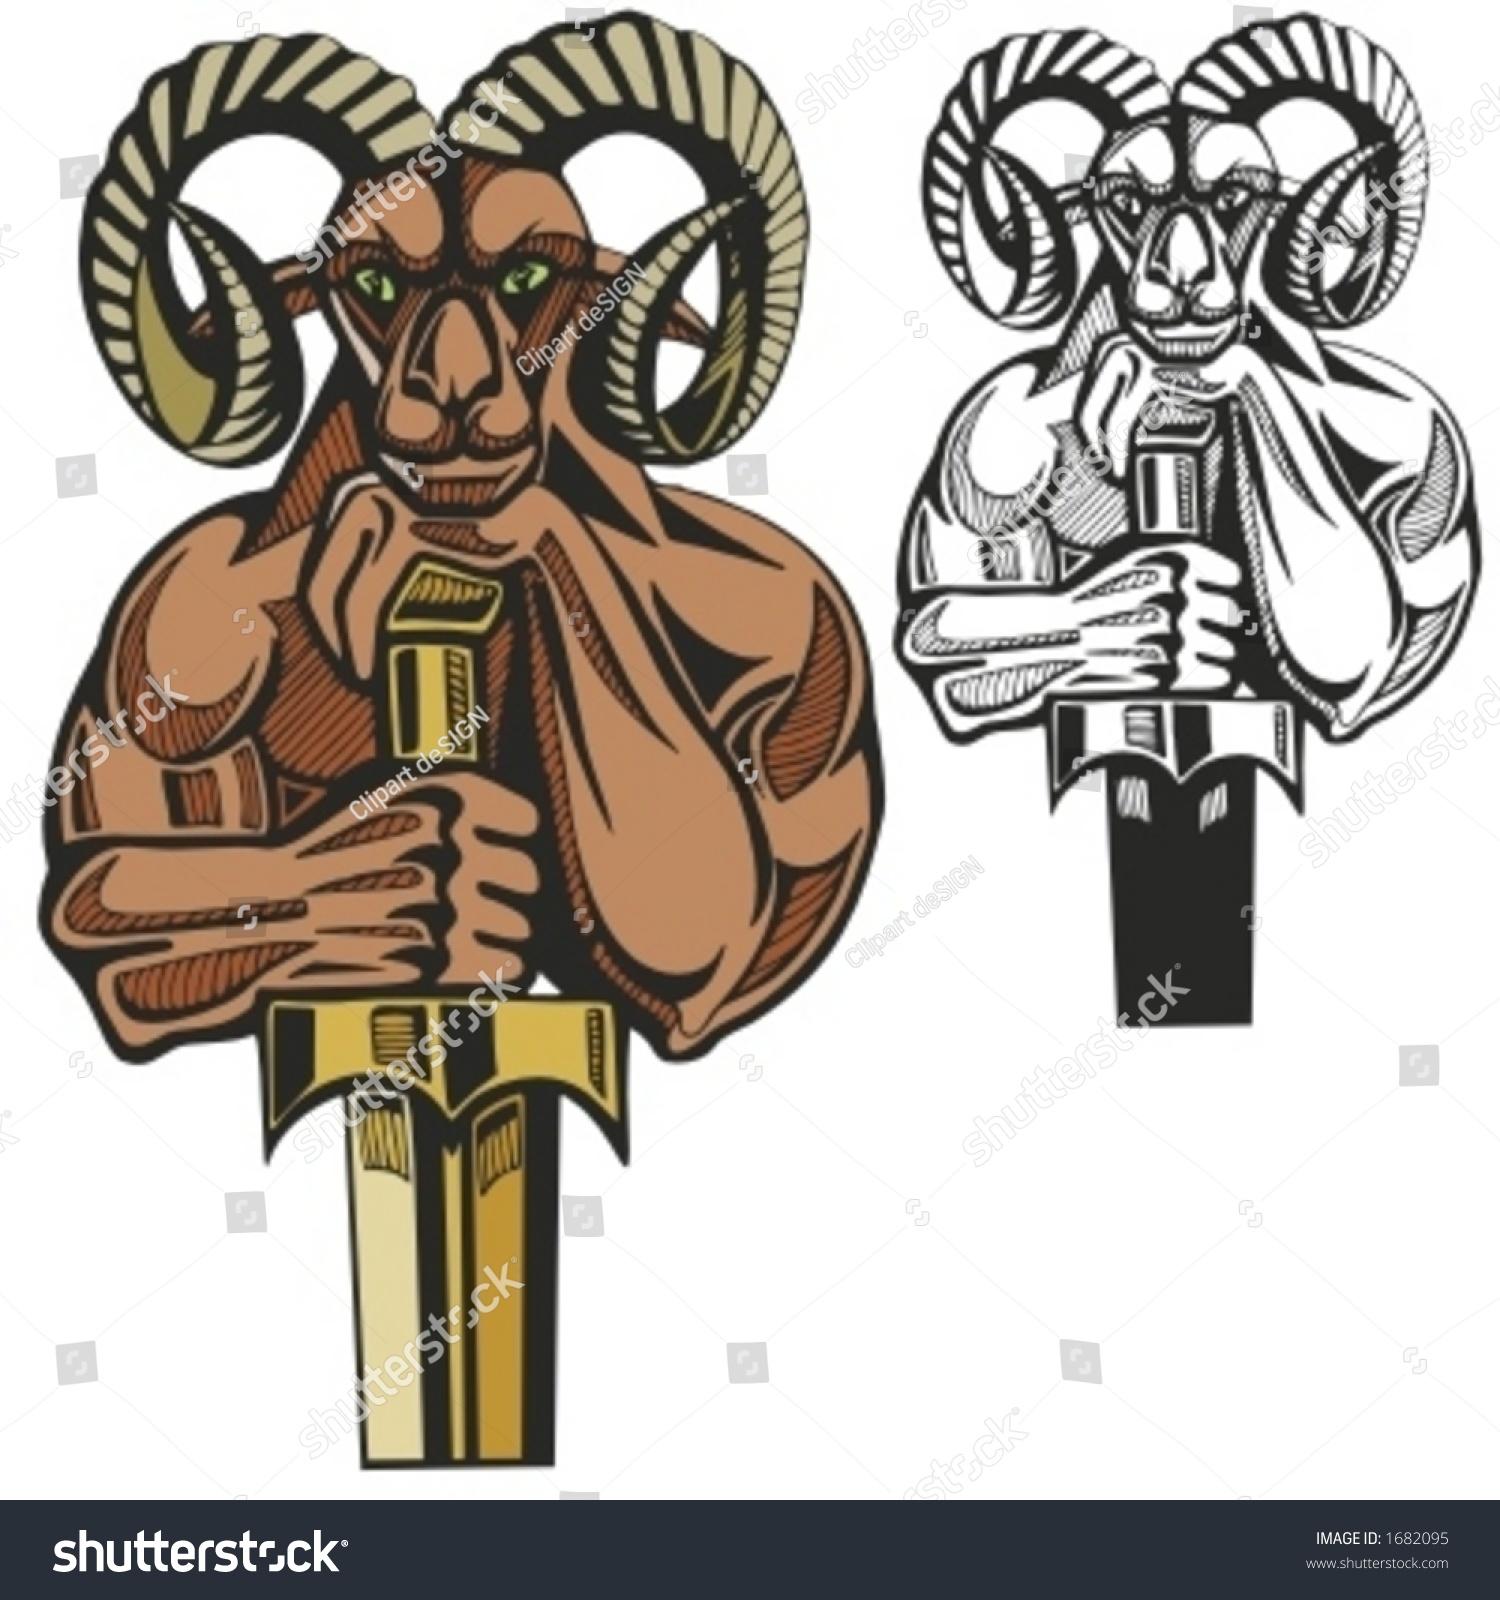 ram mascot for sport teams great for t shirt designs school mascot logo